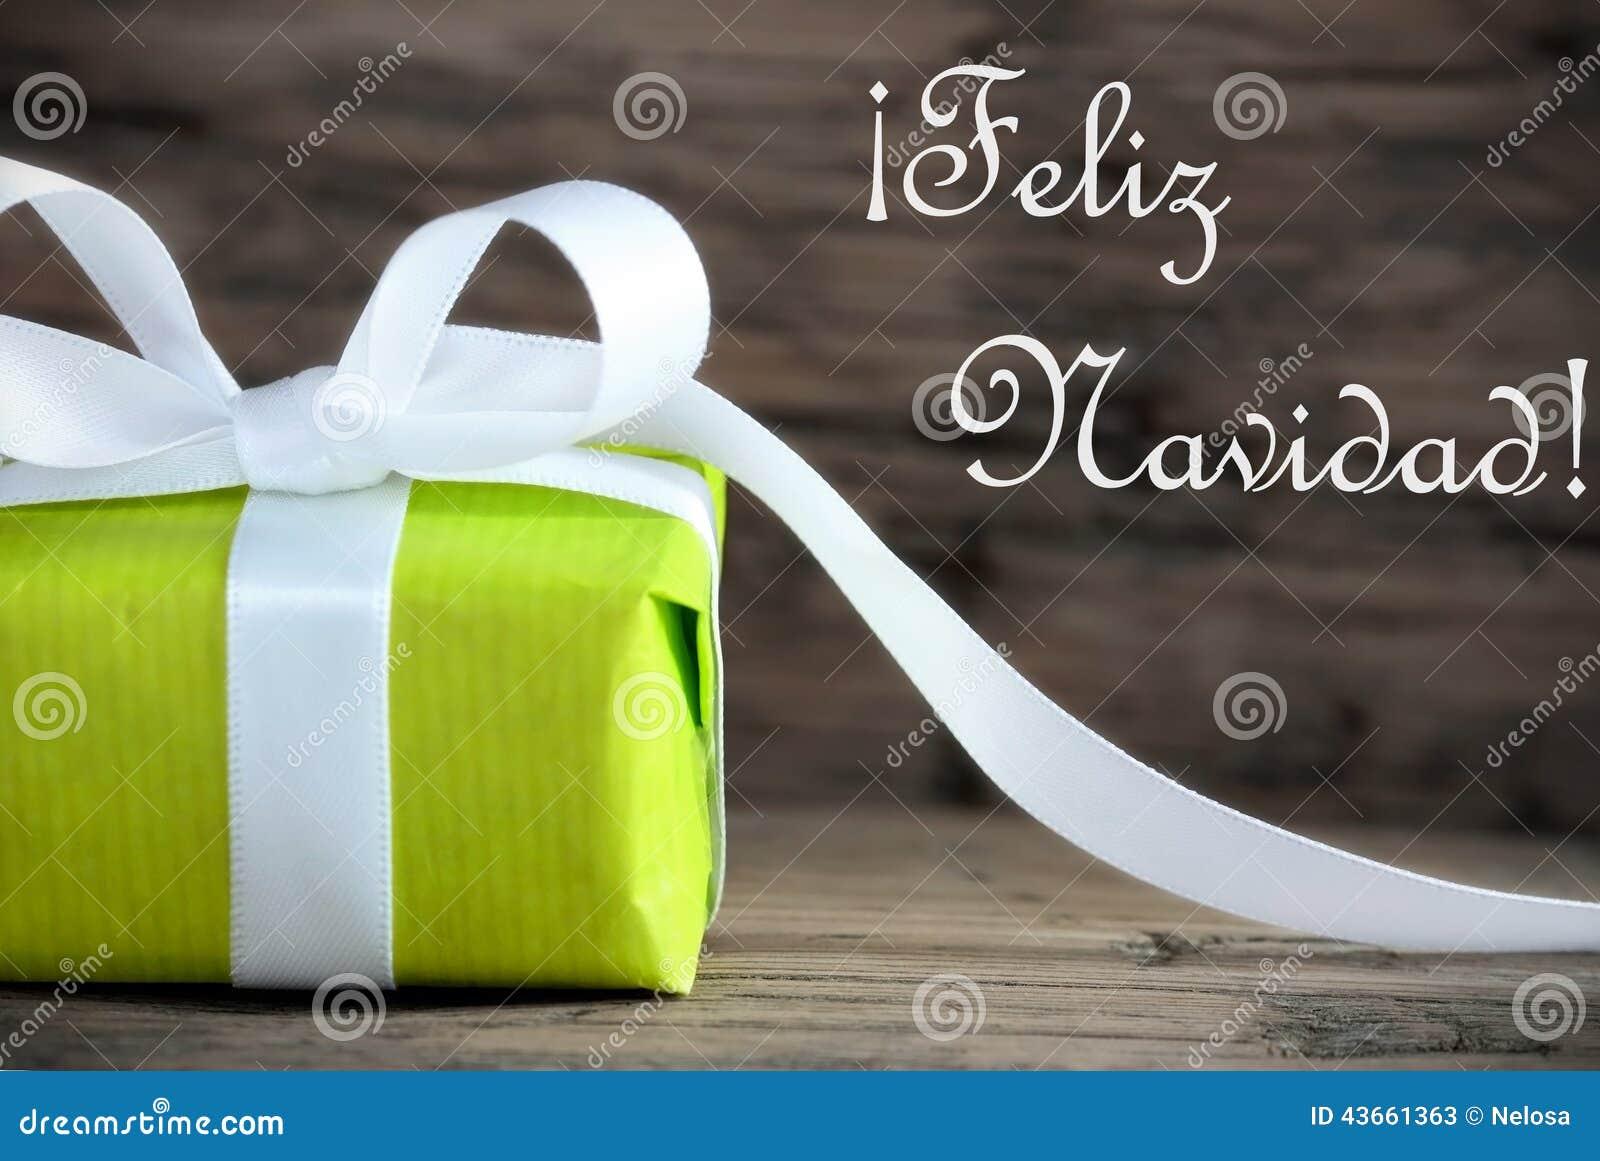 Green Gift with Feliz Navidad